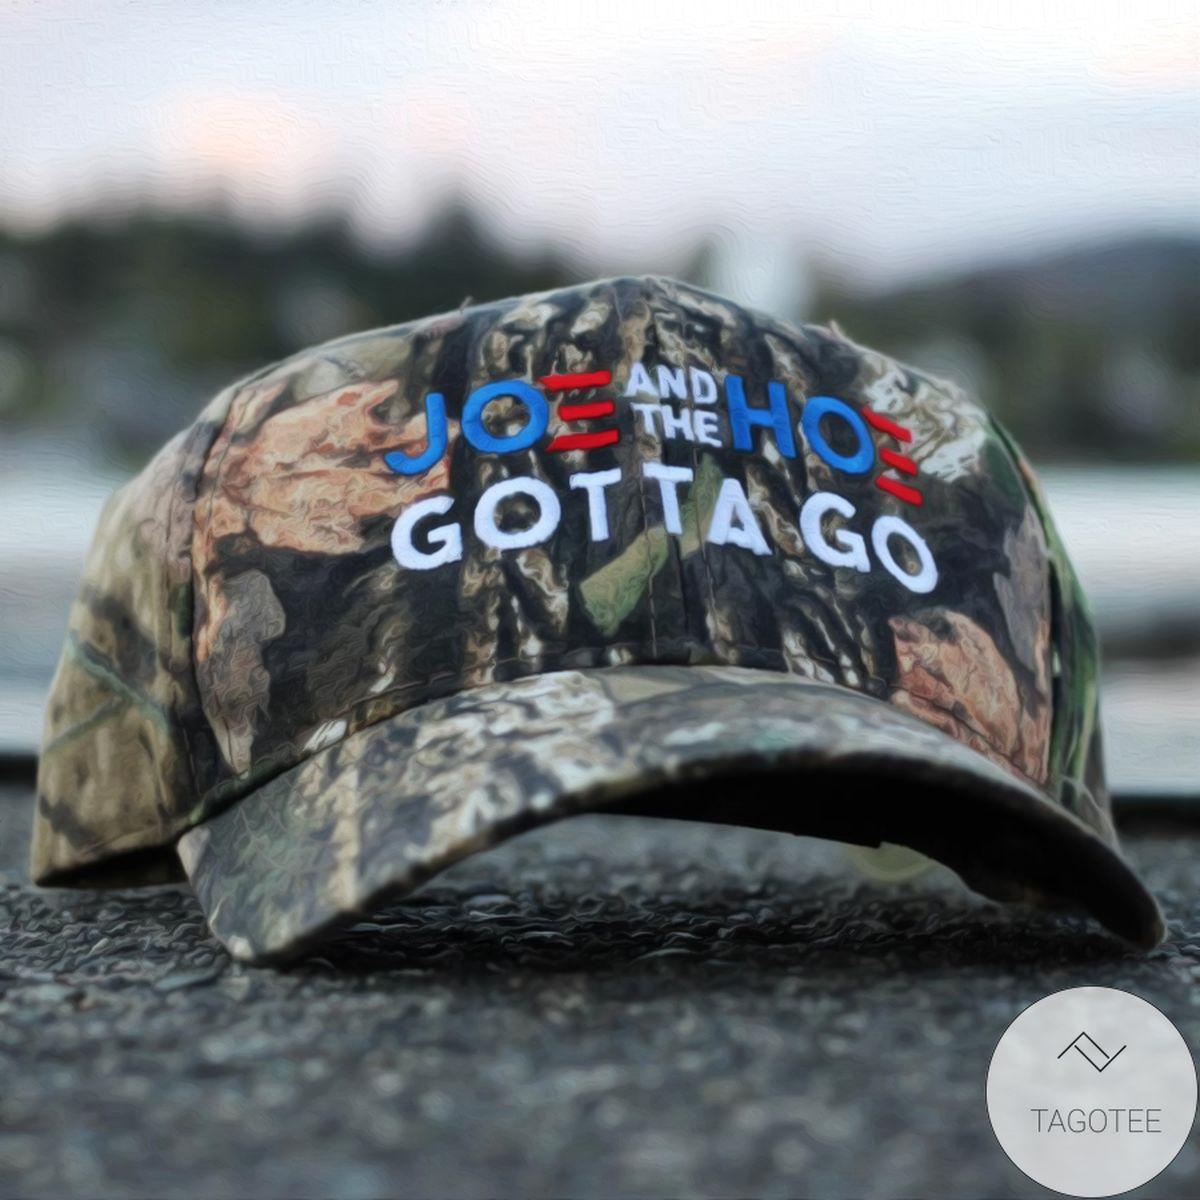 Joe And The Hoe Gotta Go Cap Camouflage Classic Cap